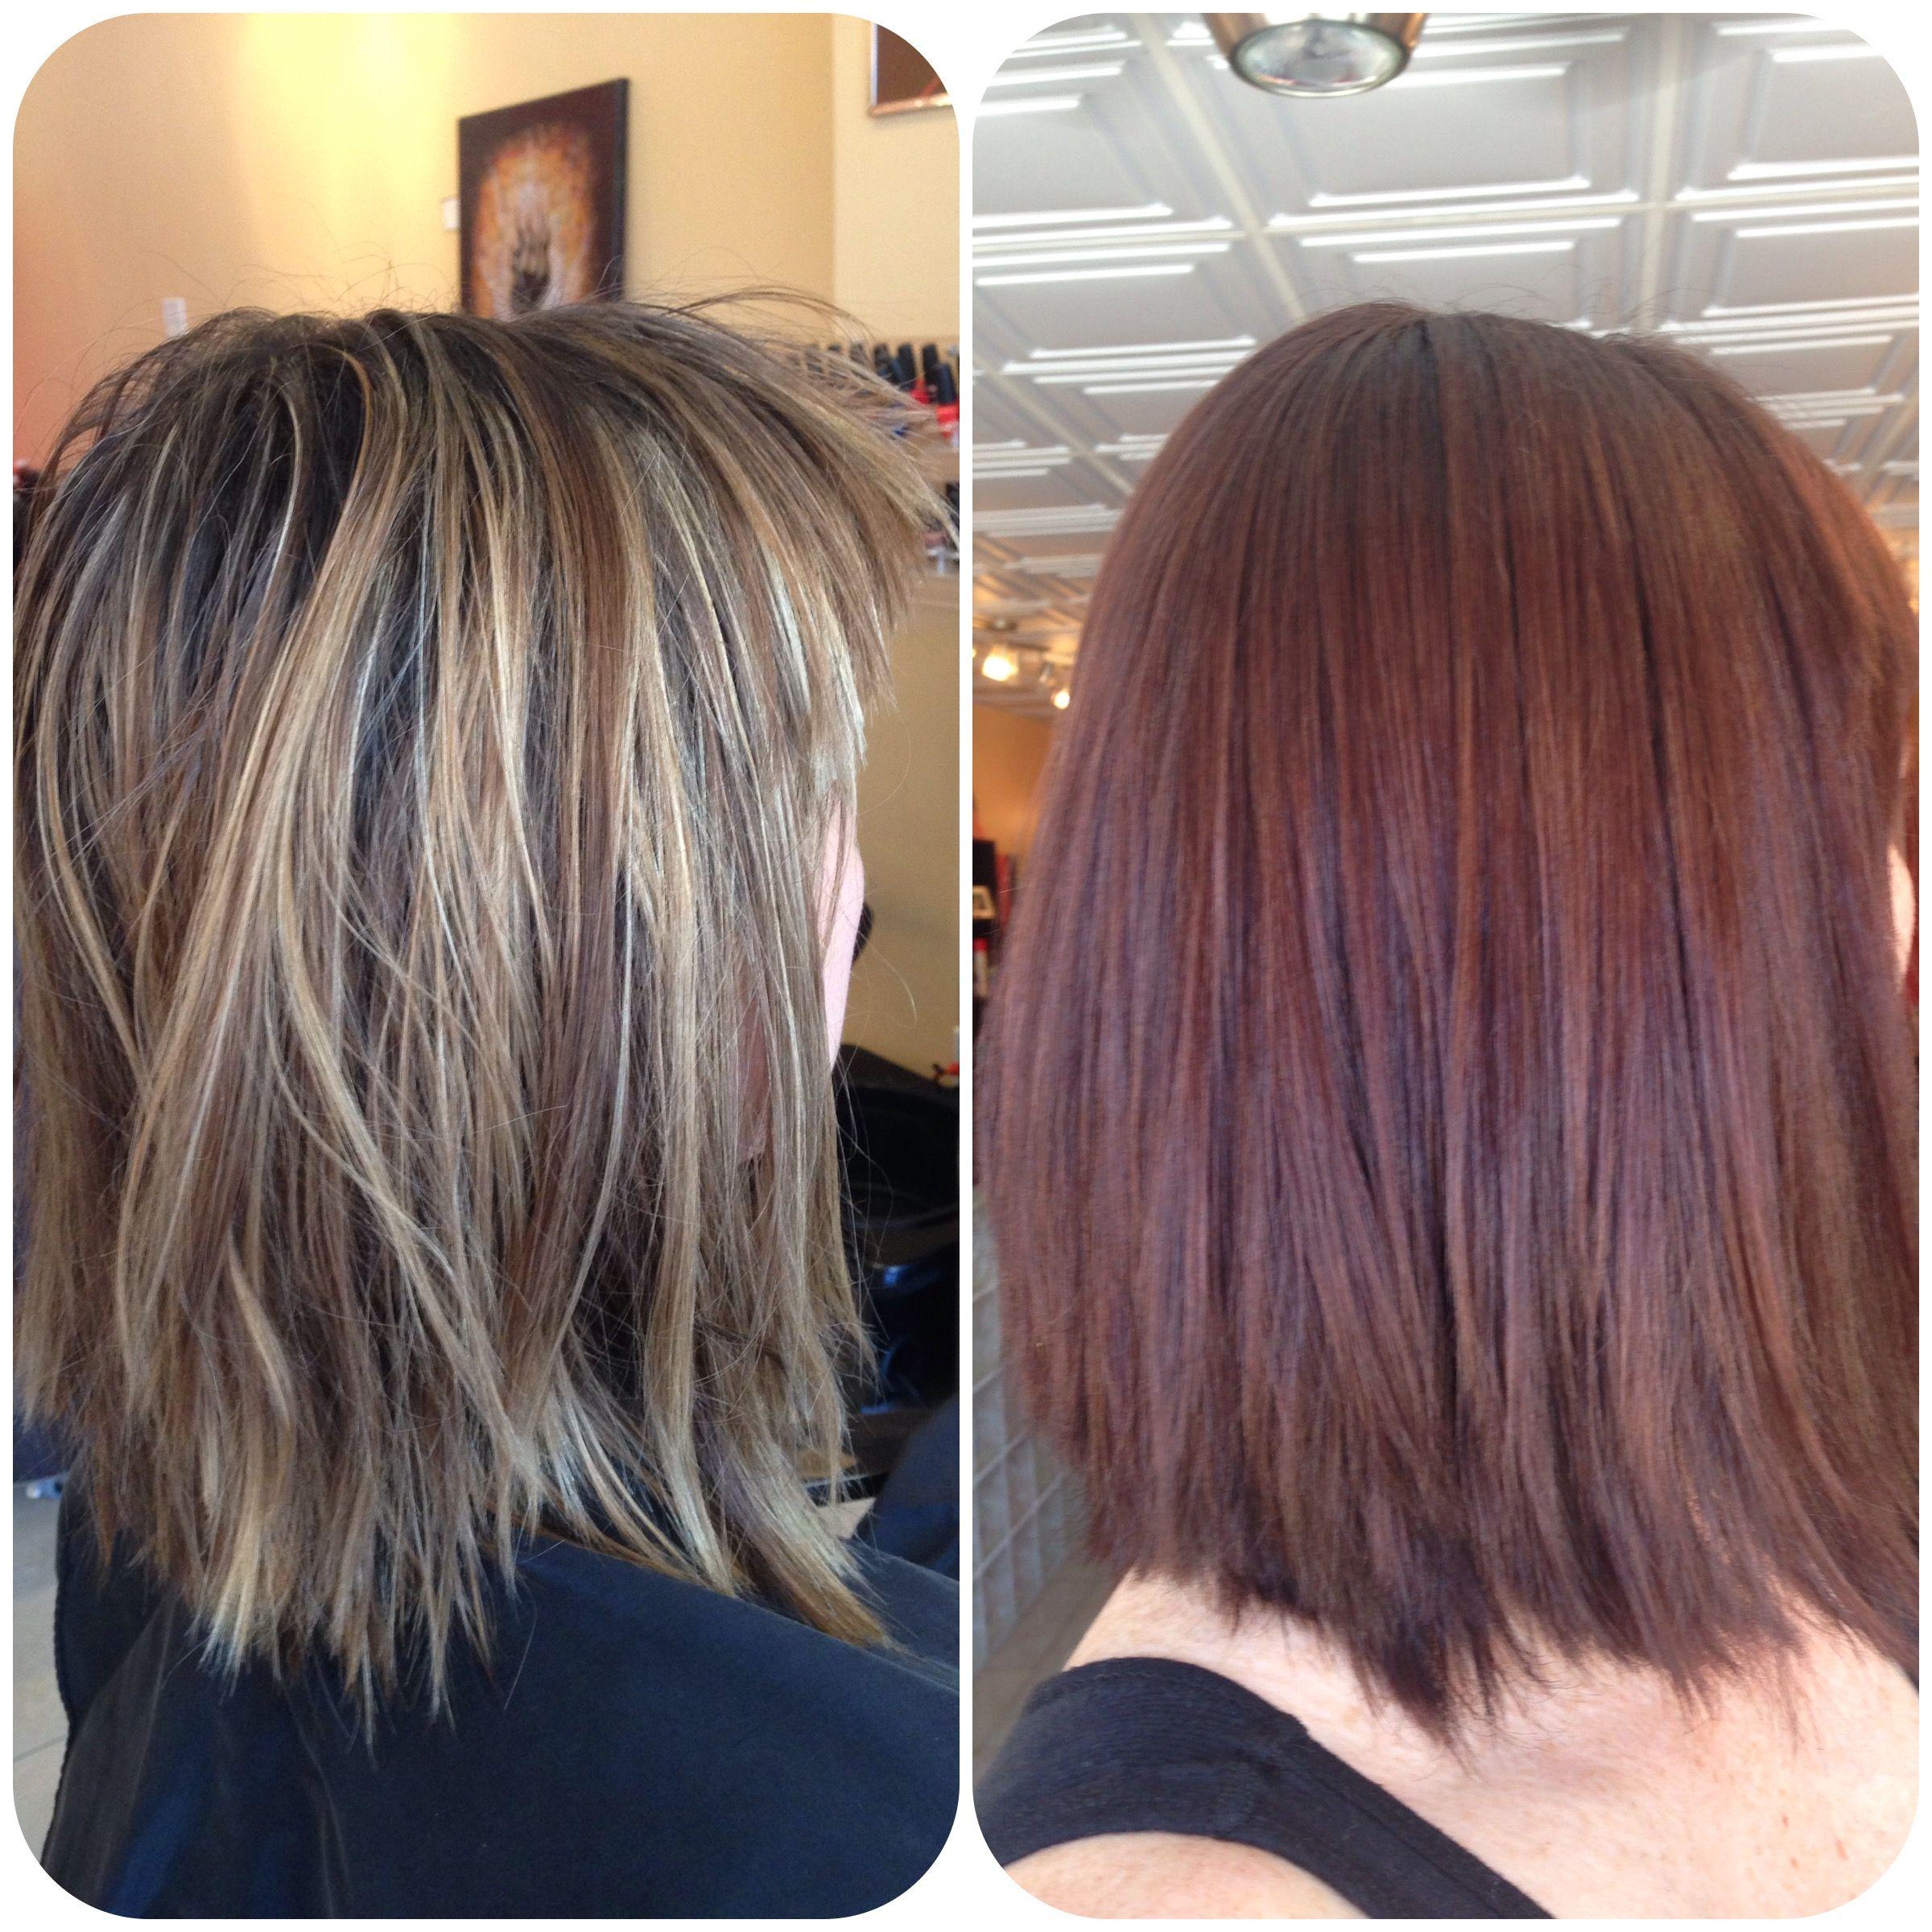 Beauty 101 Hair Salon Oceanside Natural Hair Salons Natural Hair Styles Beauty